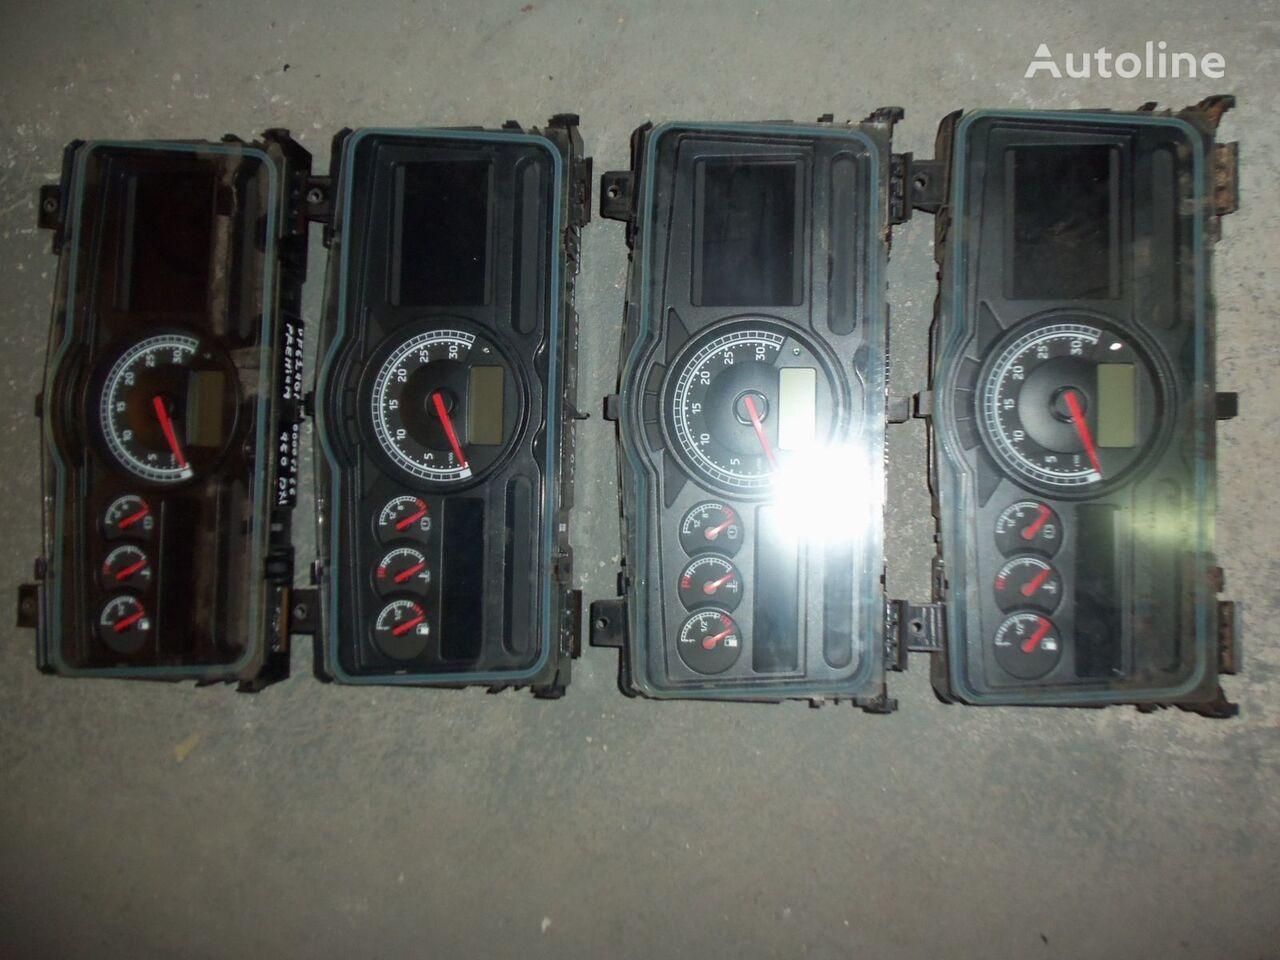 RENAULT Premium DXI tır için Renault Premium DXI instrument panel, dashboard, 7420771818 cihaz paneli